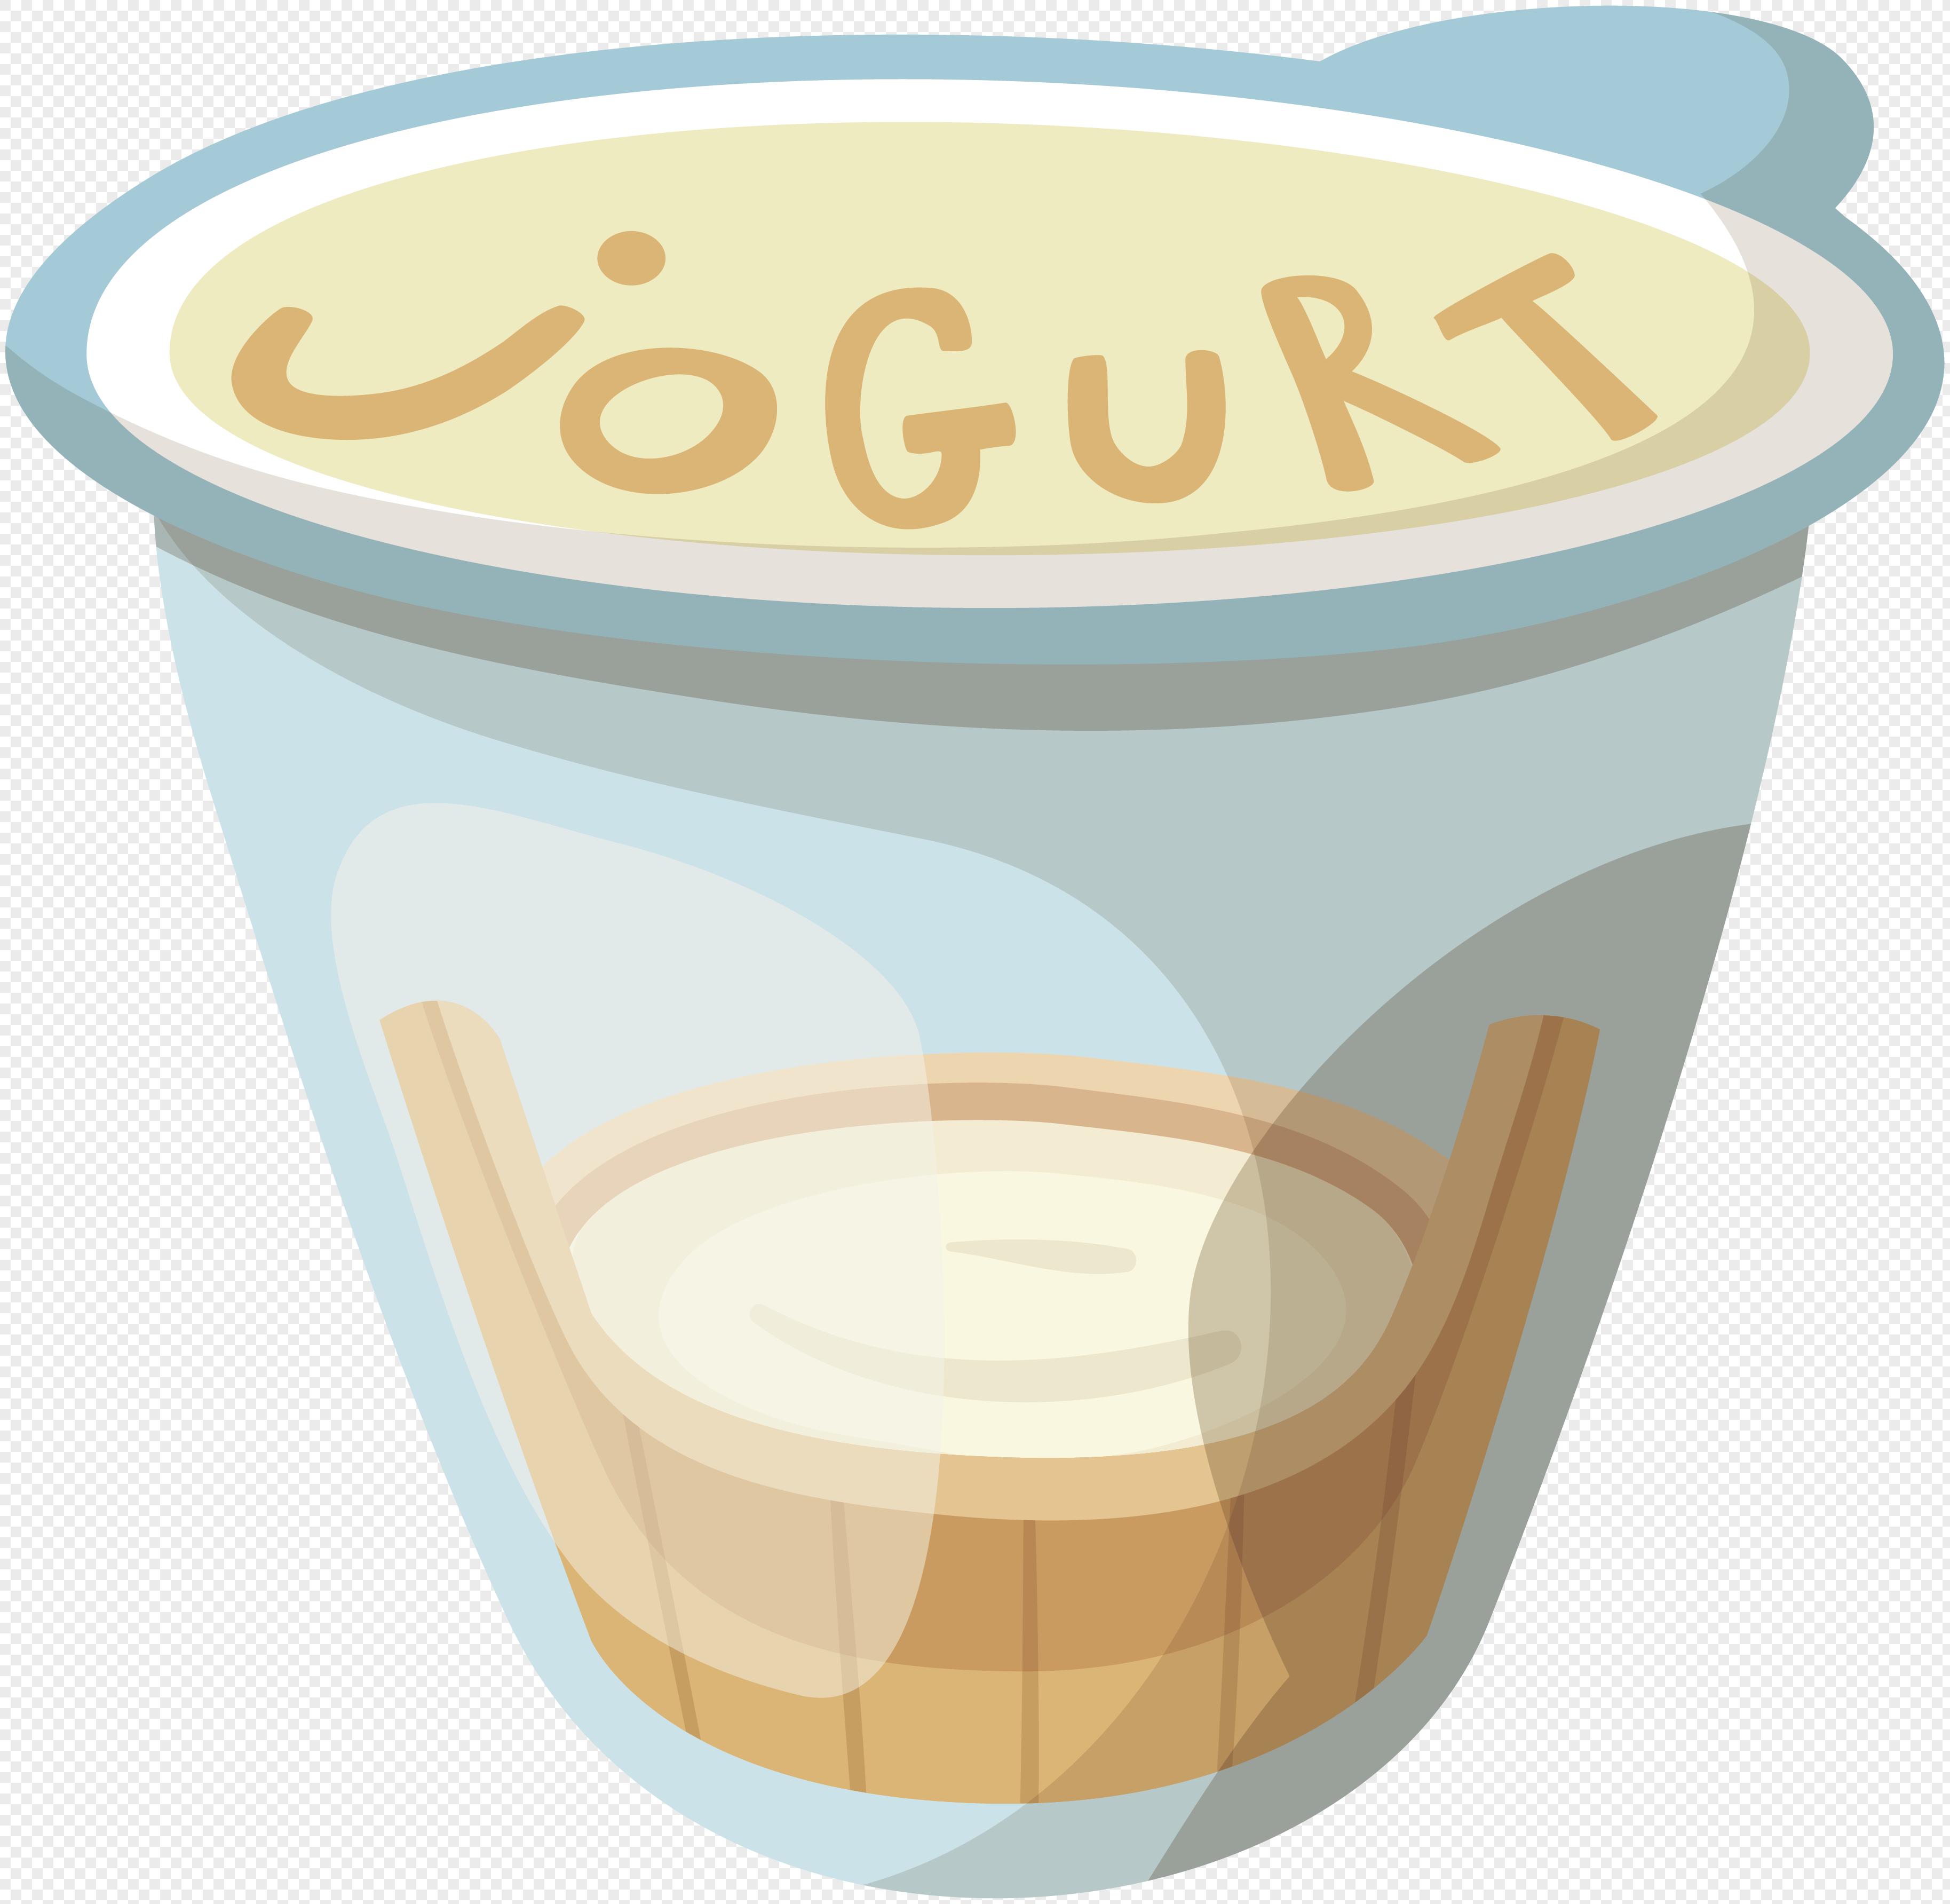 3654x3567 Hand Drawn Cartoon Food Ingredients Yogurt Vector Elements Png